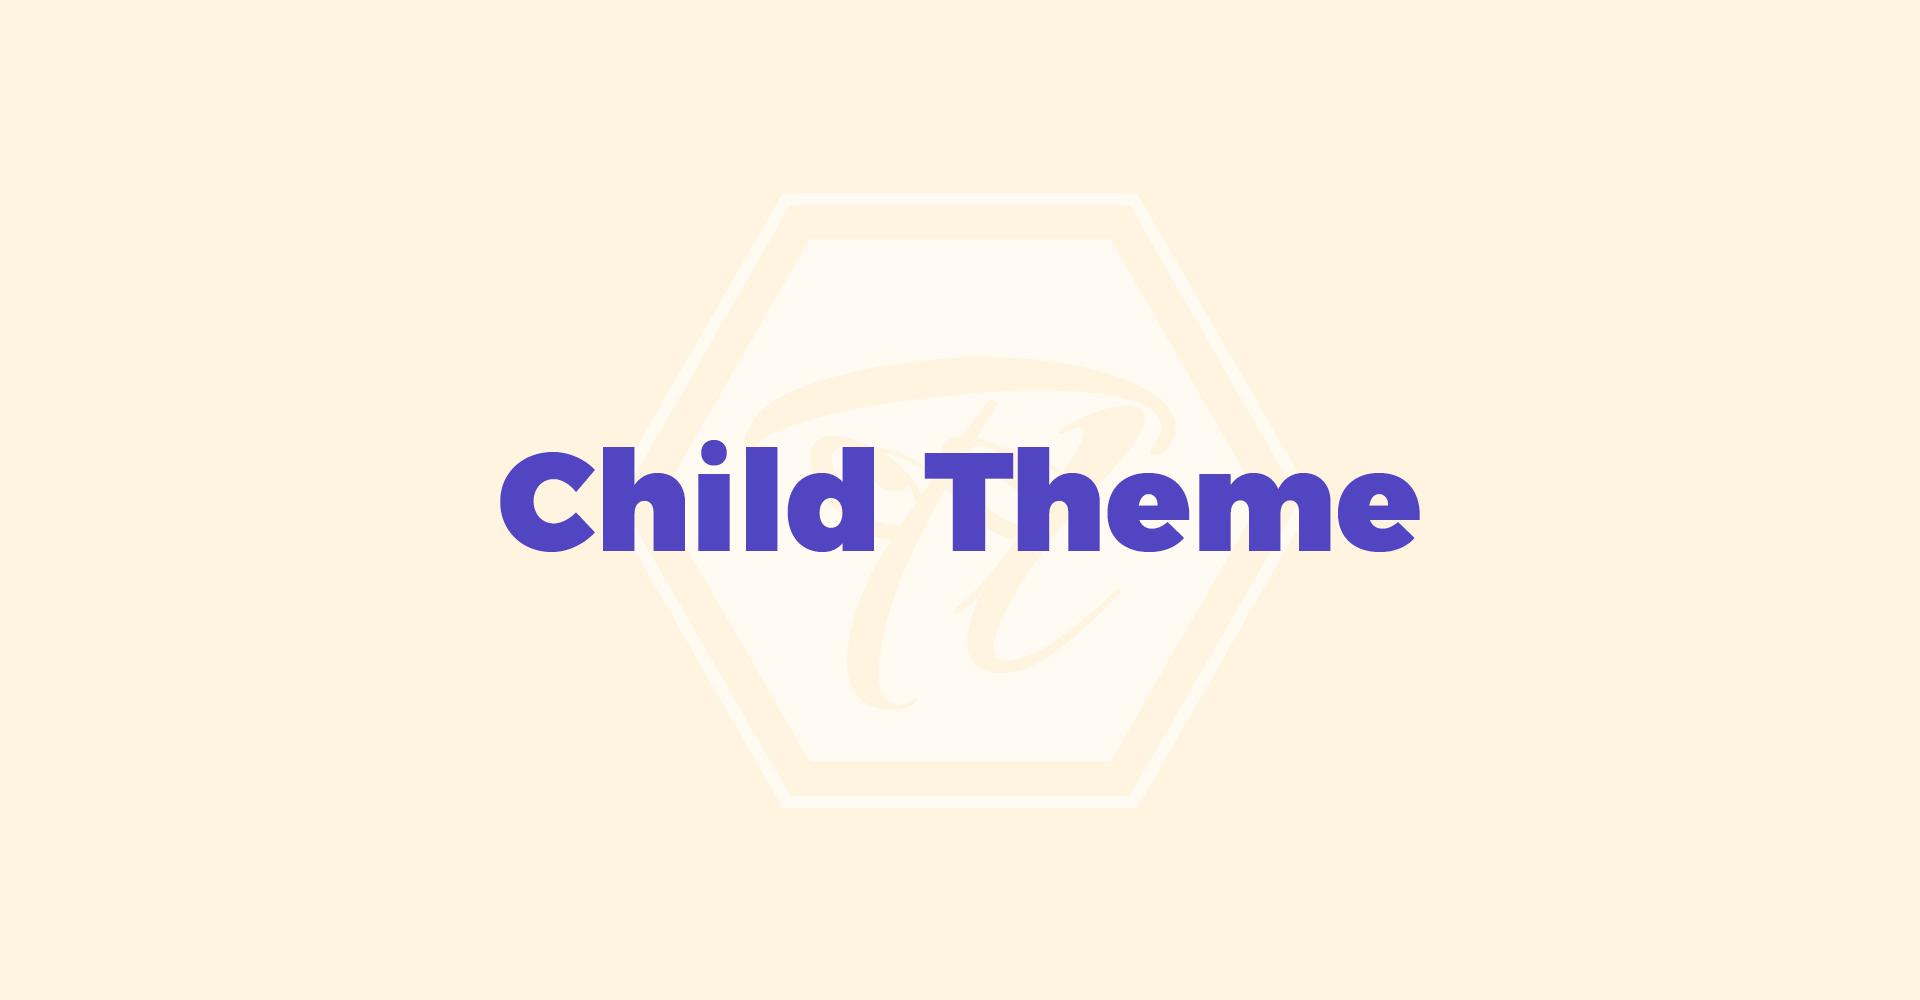 child_theme 1 1